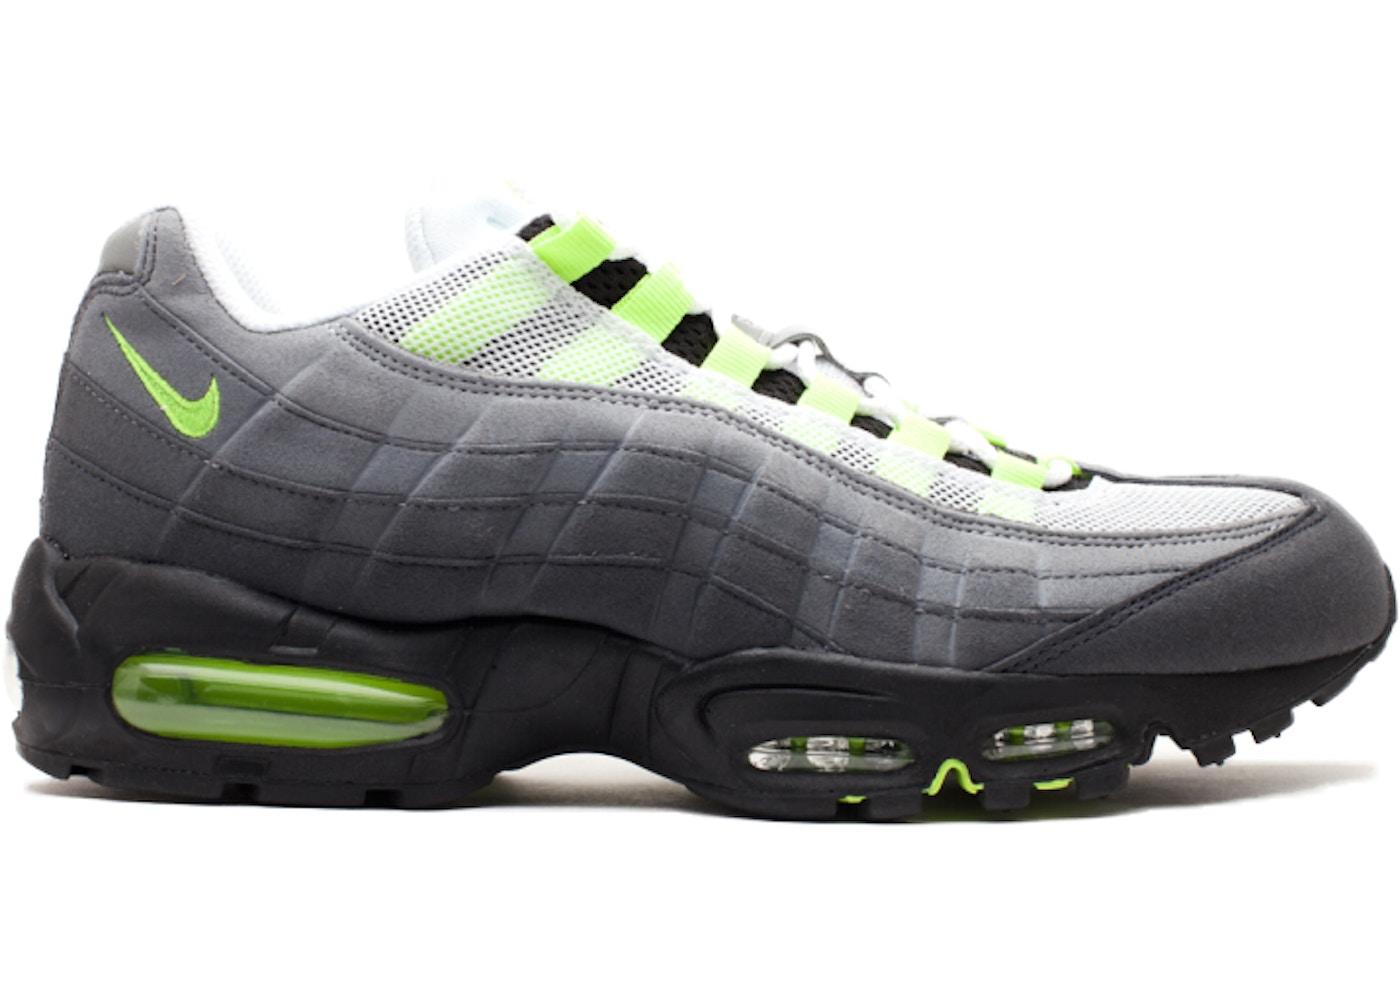 187a2dd63f Nike Air Max 95 Shoes - Last Sale